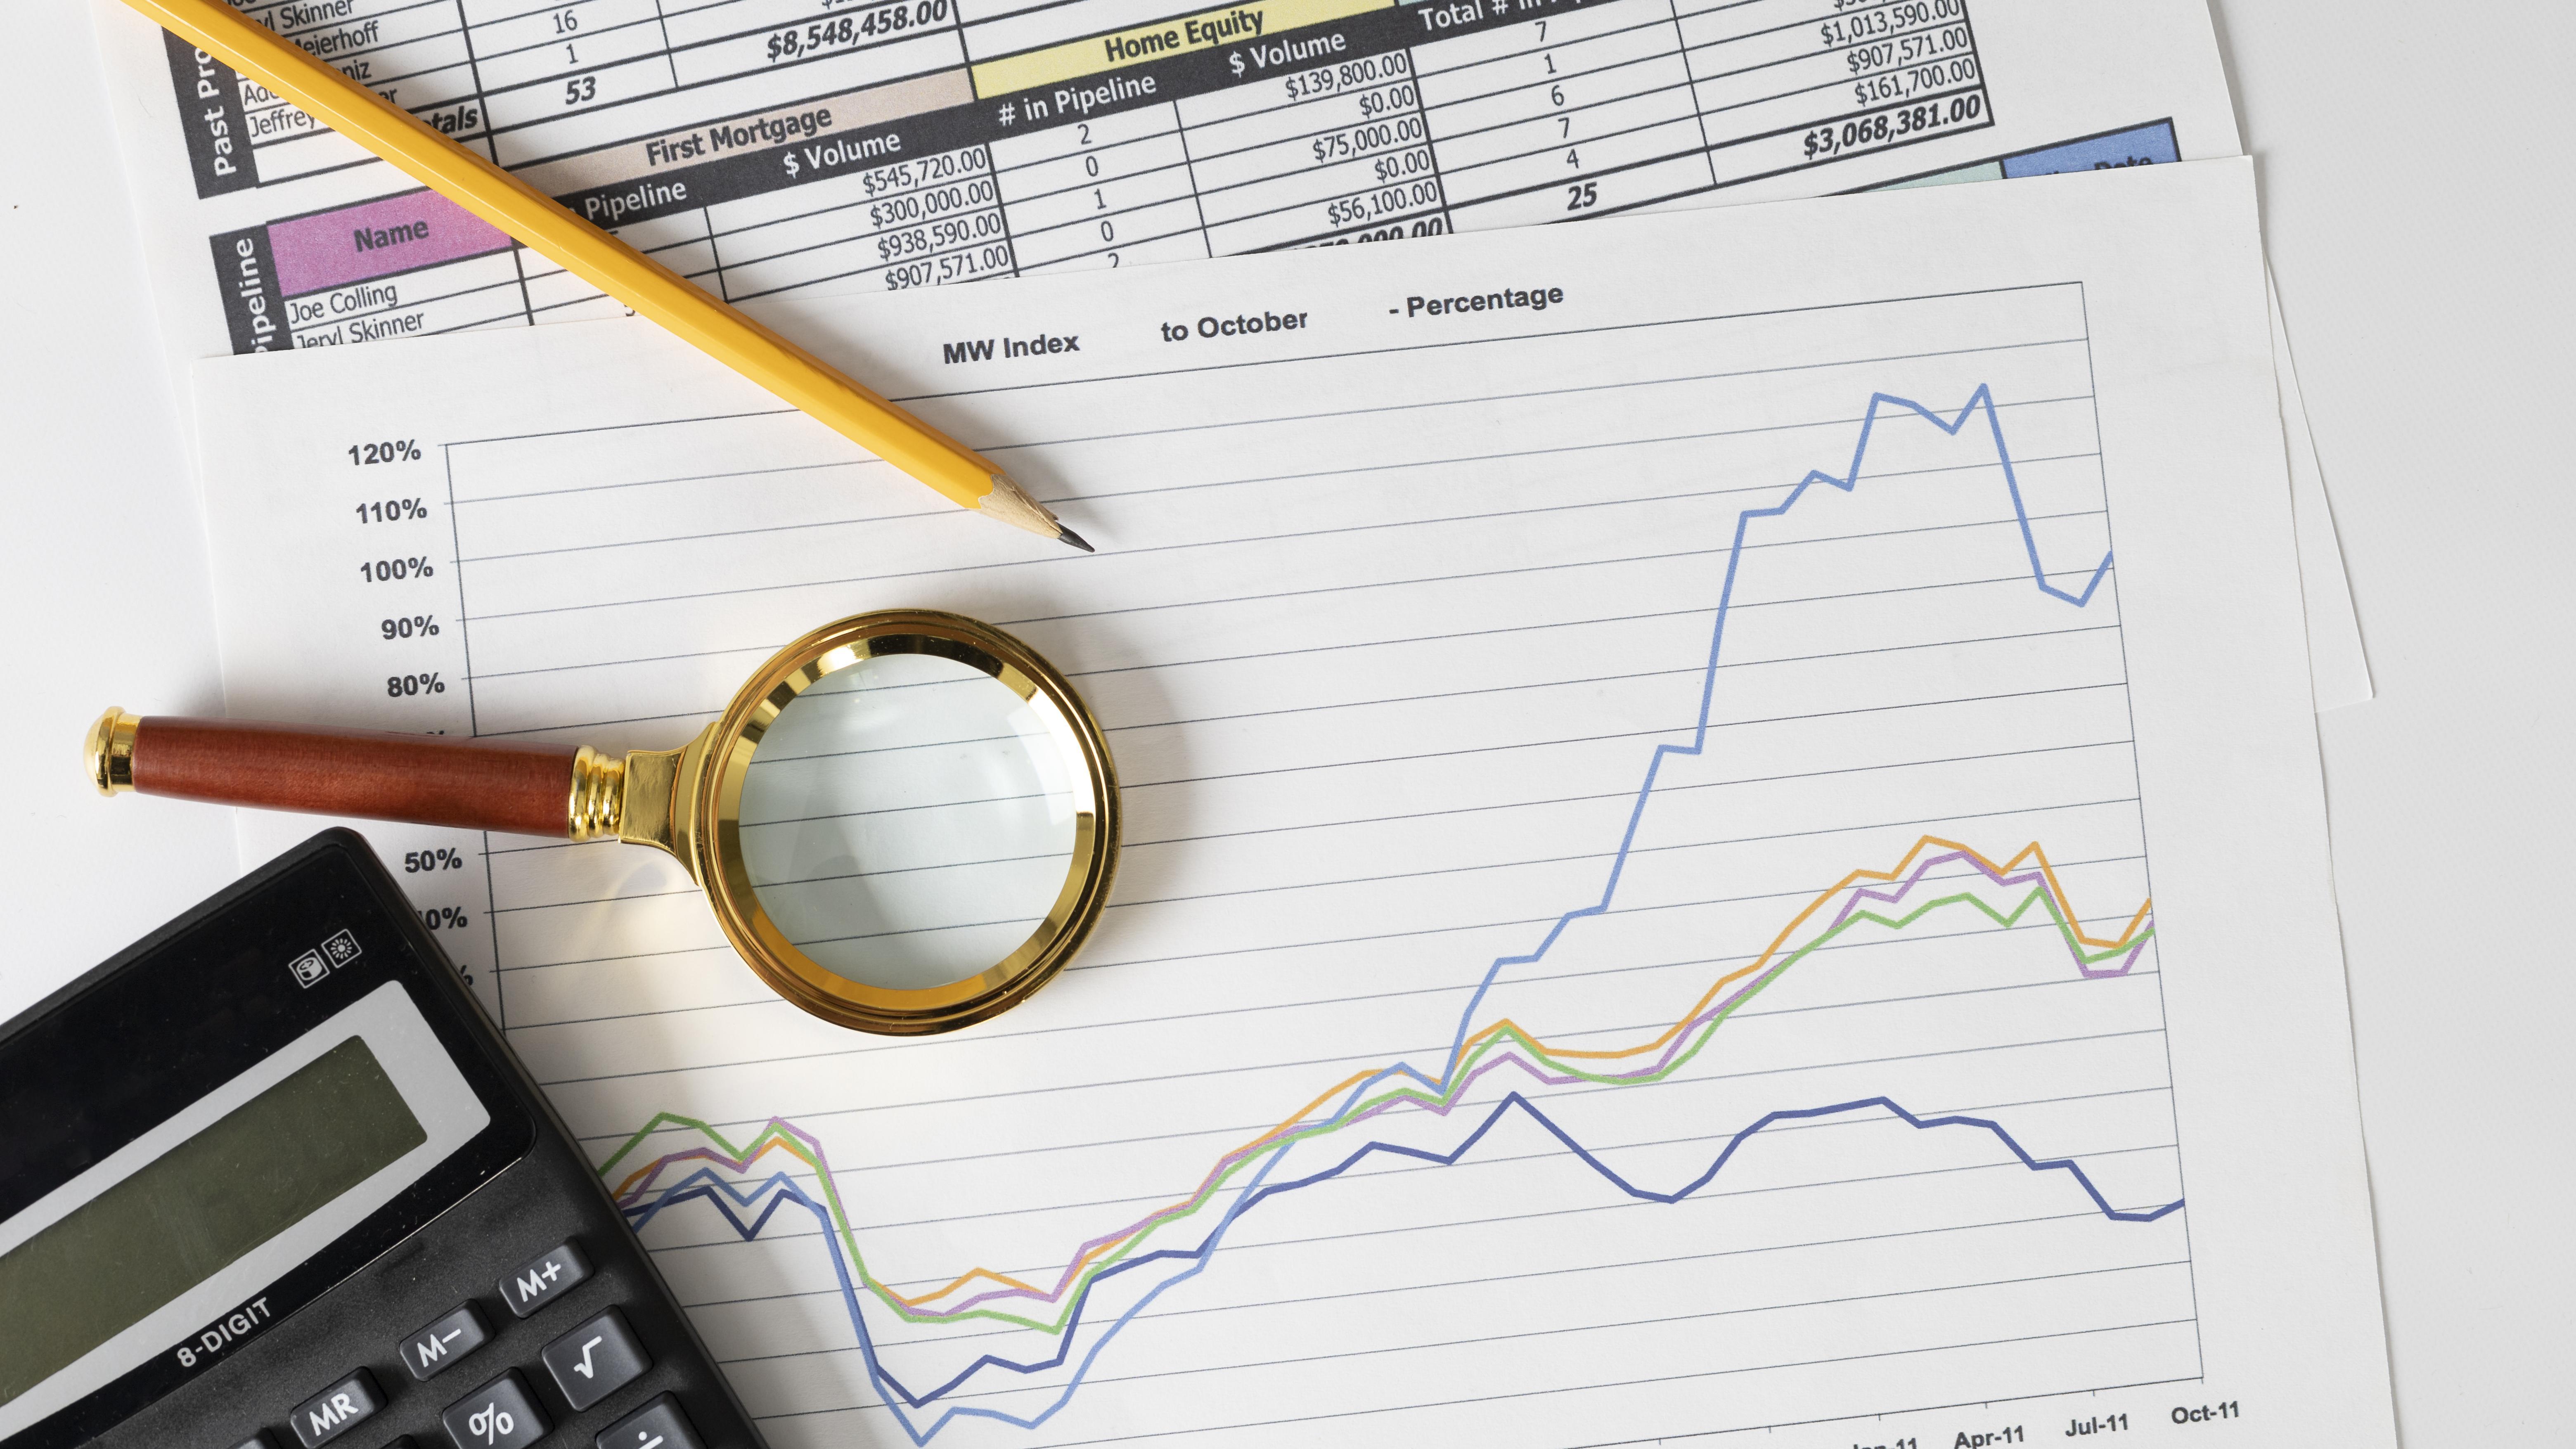 Lager pensioen en minder vertrouwen na stelselwijziging